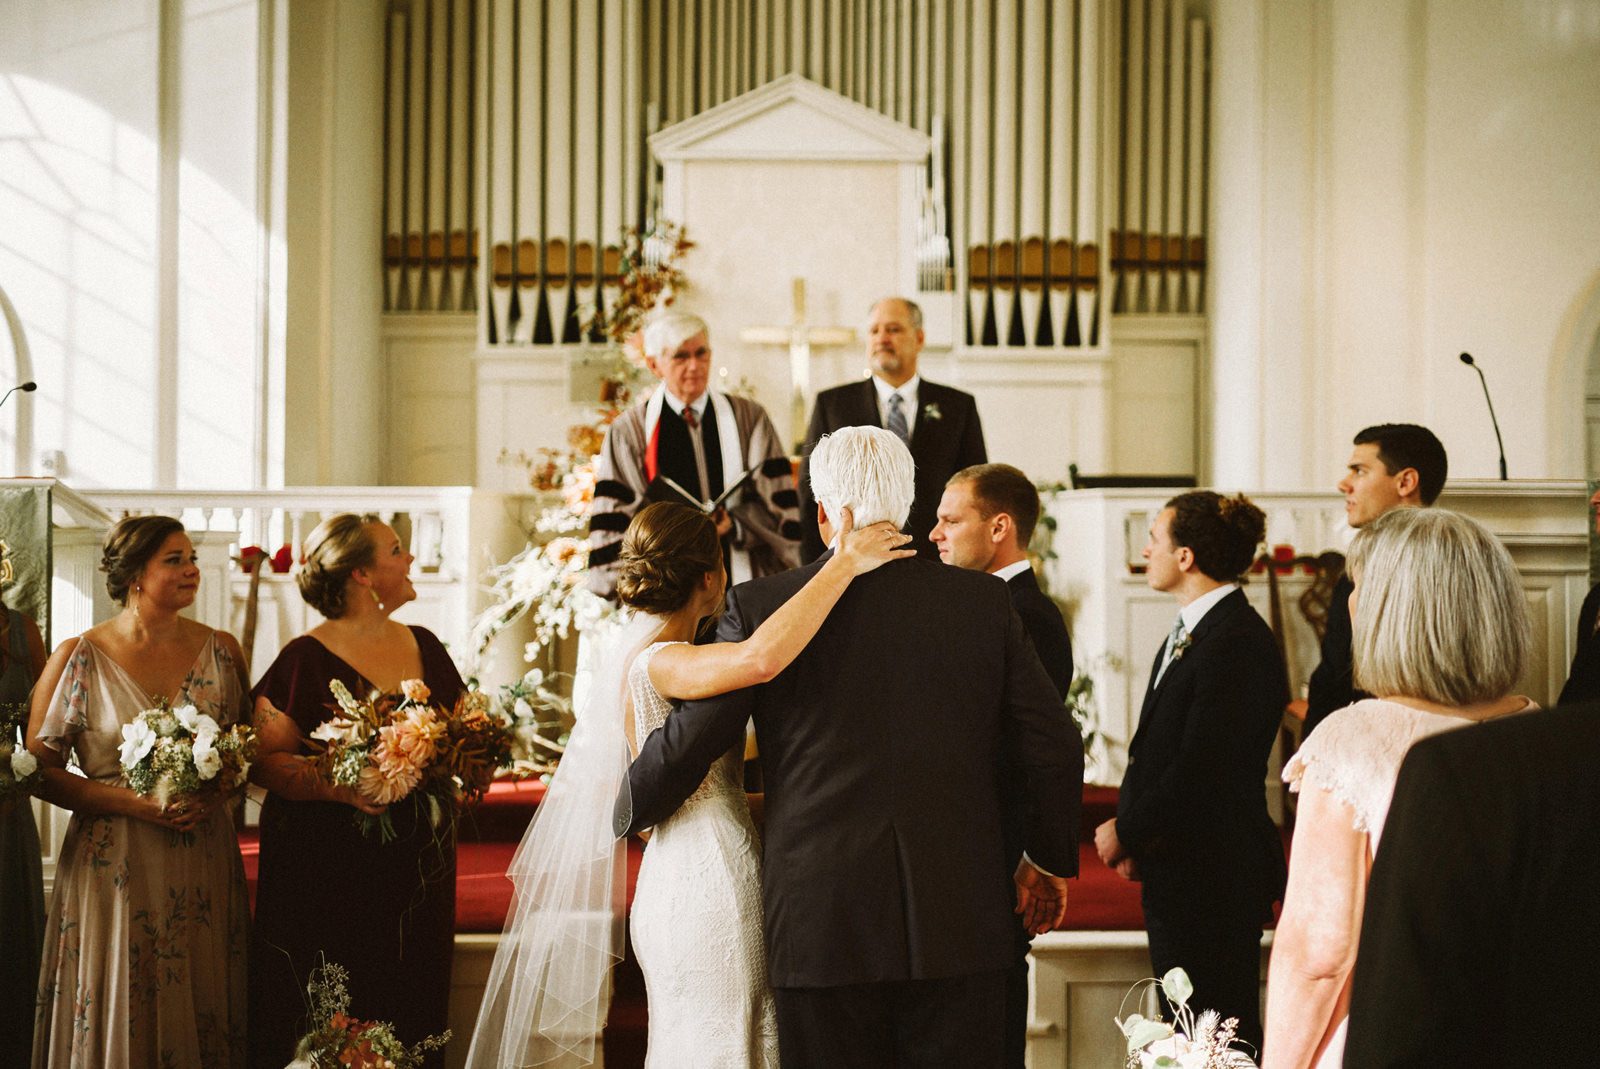 bridgeport-wedding-055 BRIDGEPORT, CONNECTICUT BACKYARD WEDDING